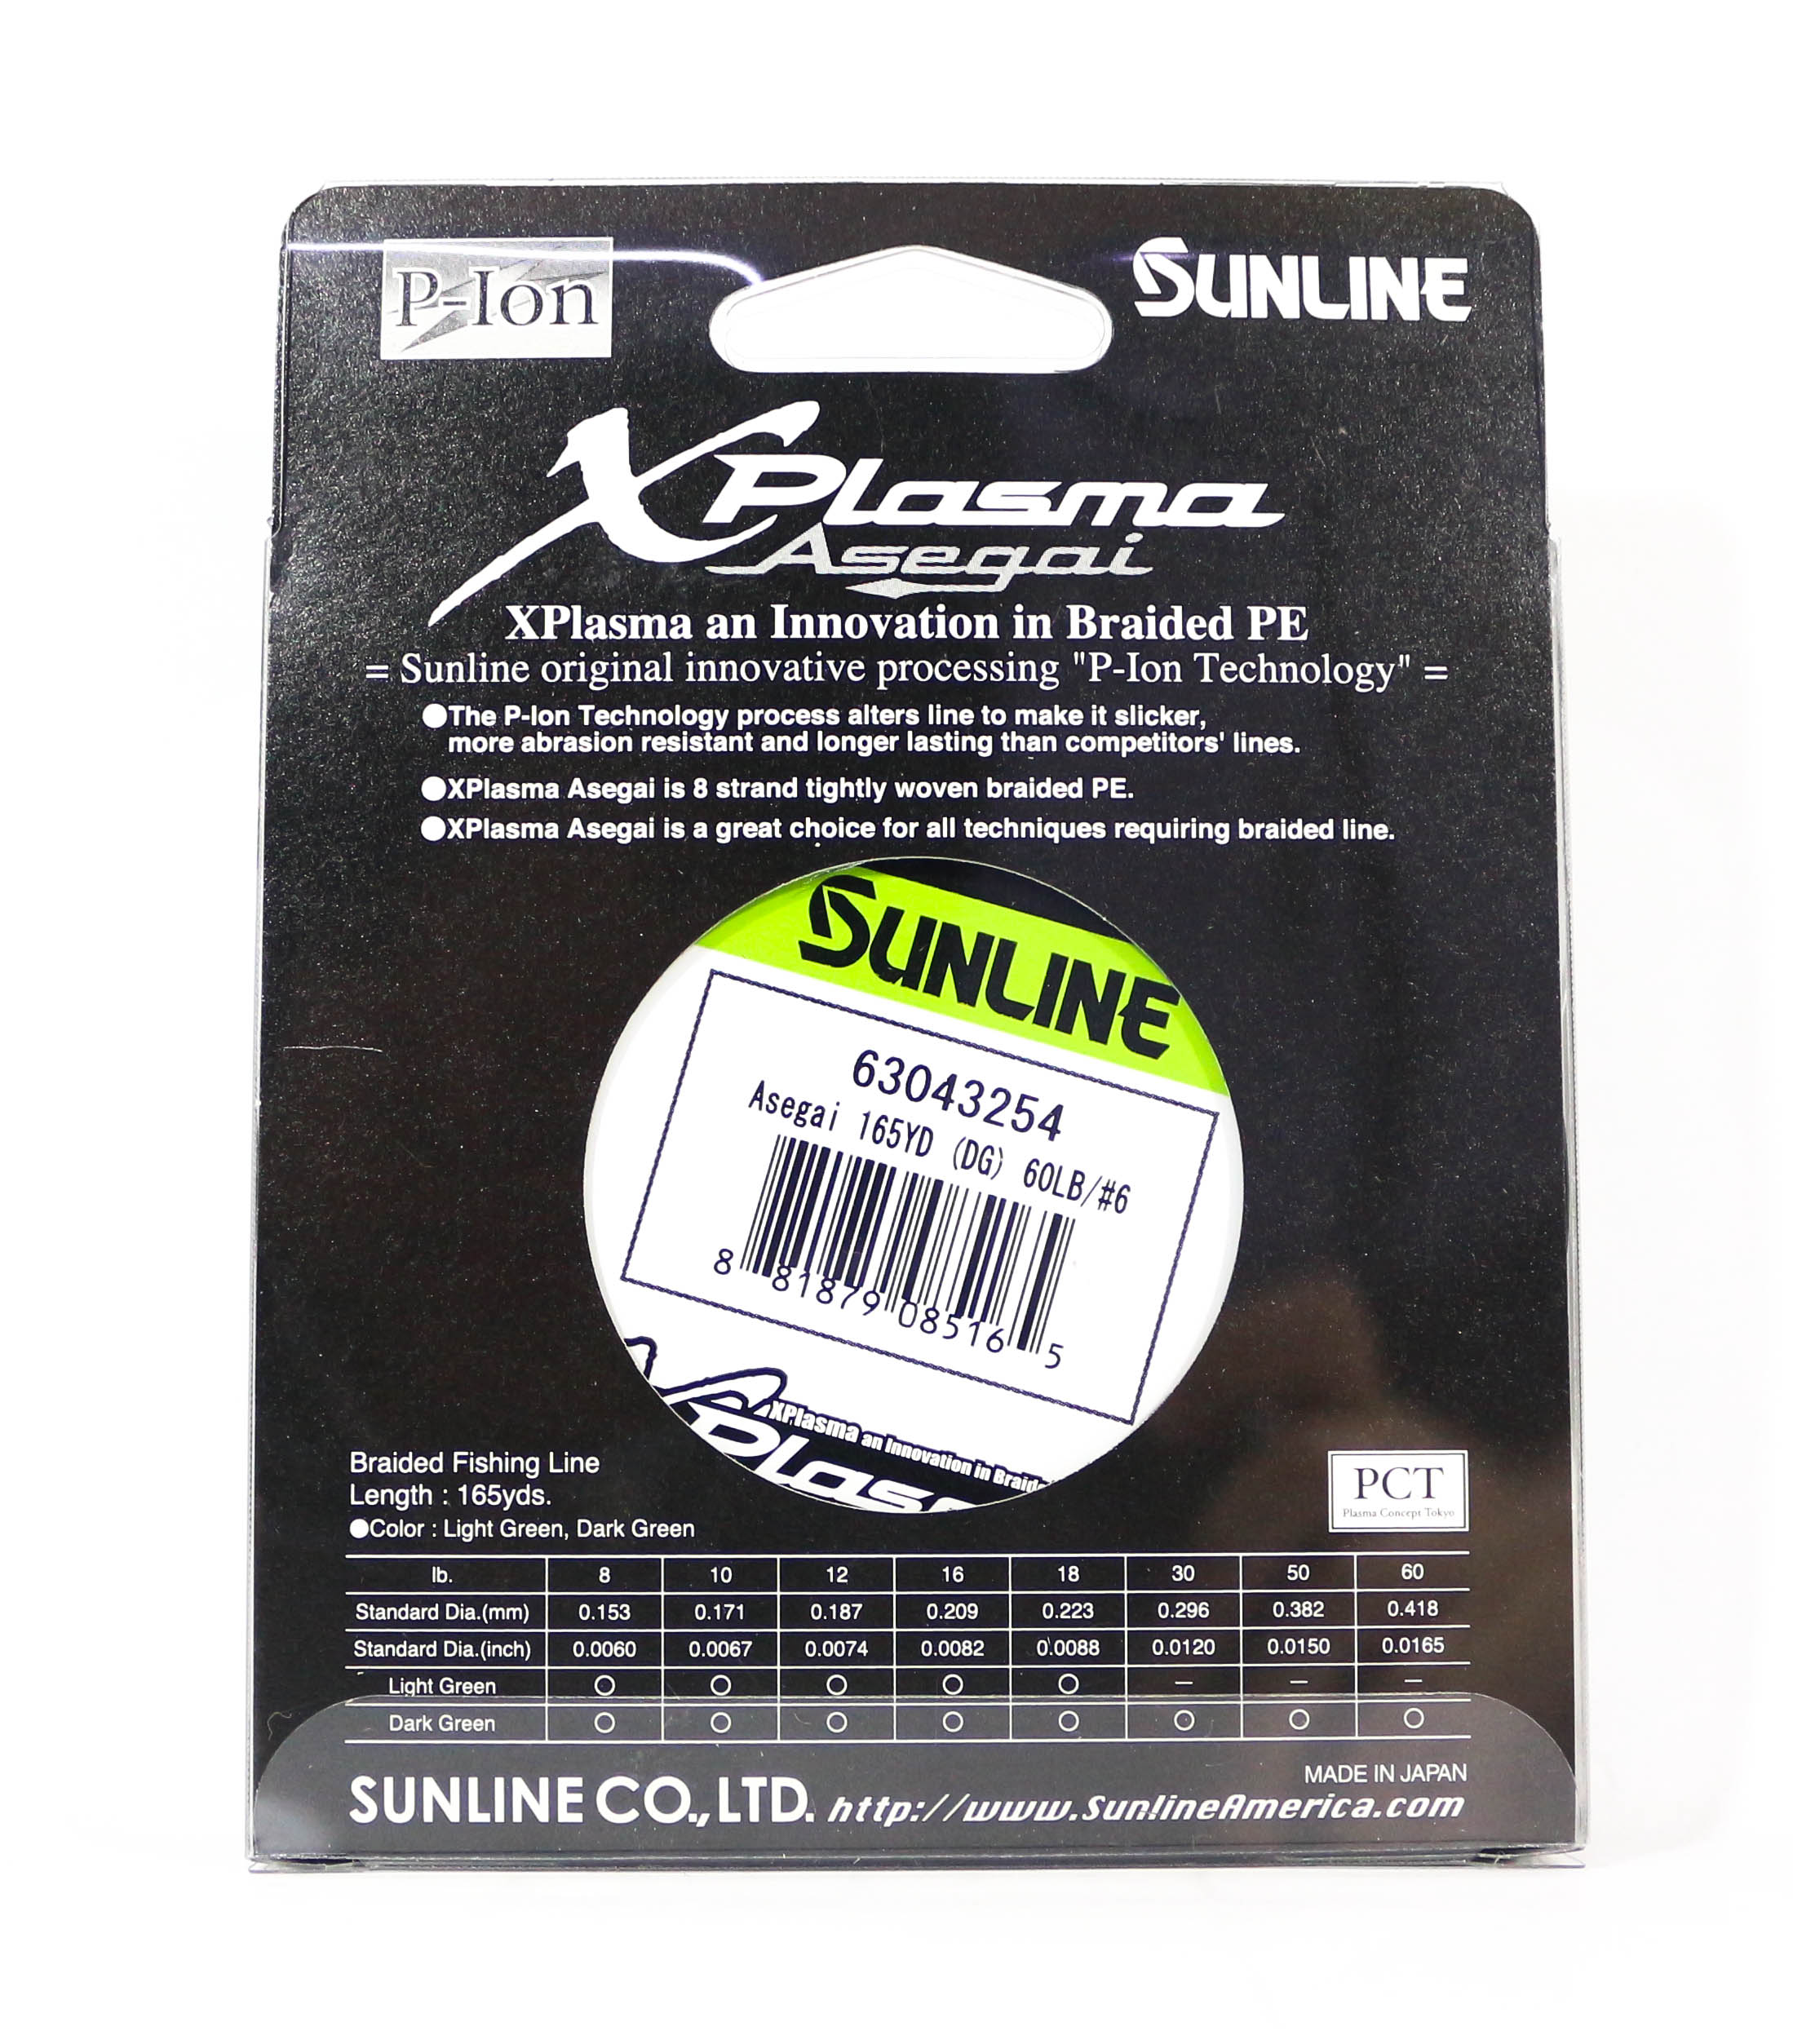 5134 Sunline Asegai Xplasma Braided Linie 165yds P.E 1.7 18lb Dark Green